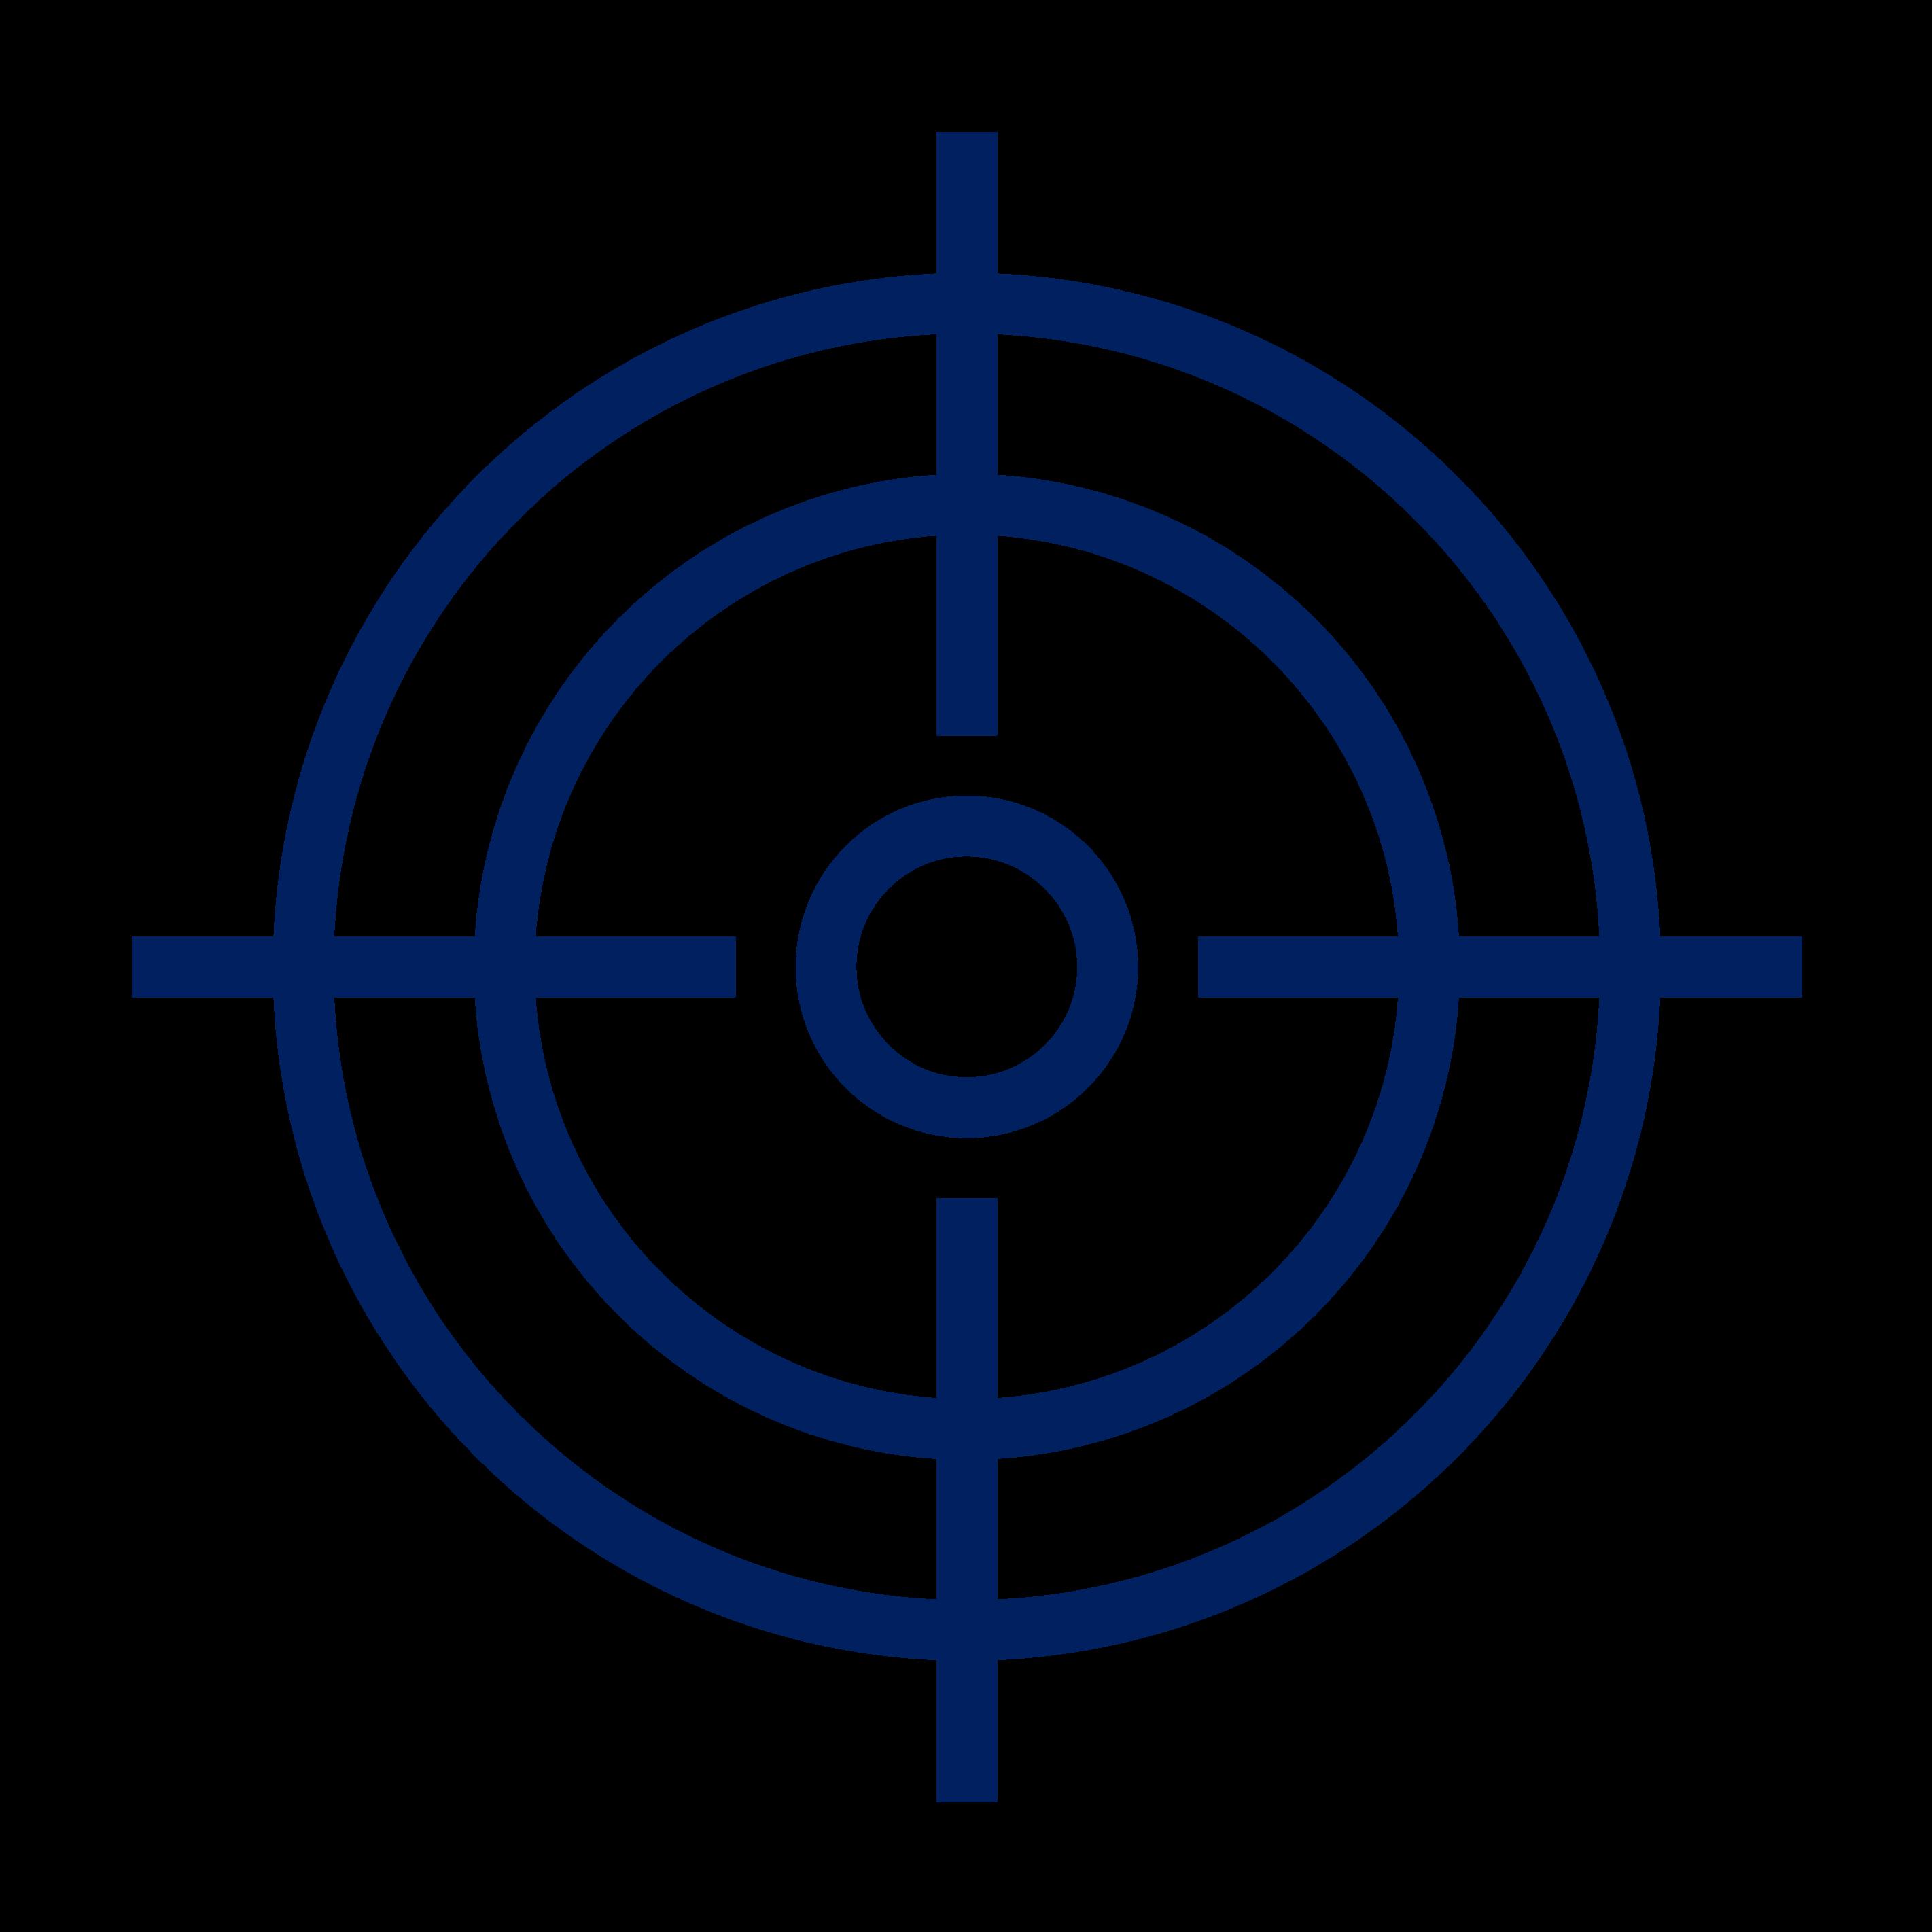 Icon - Target